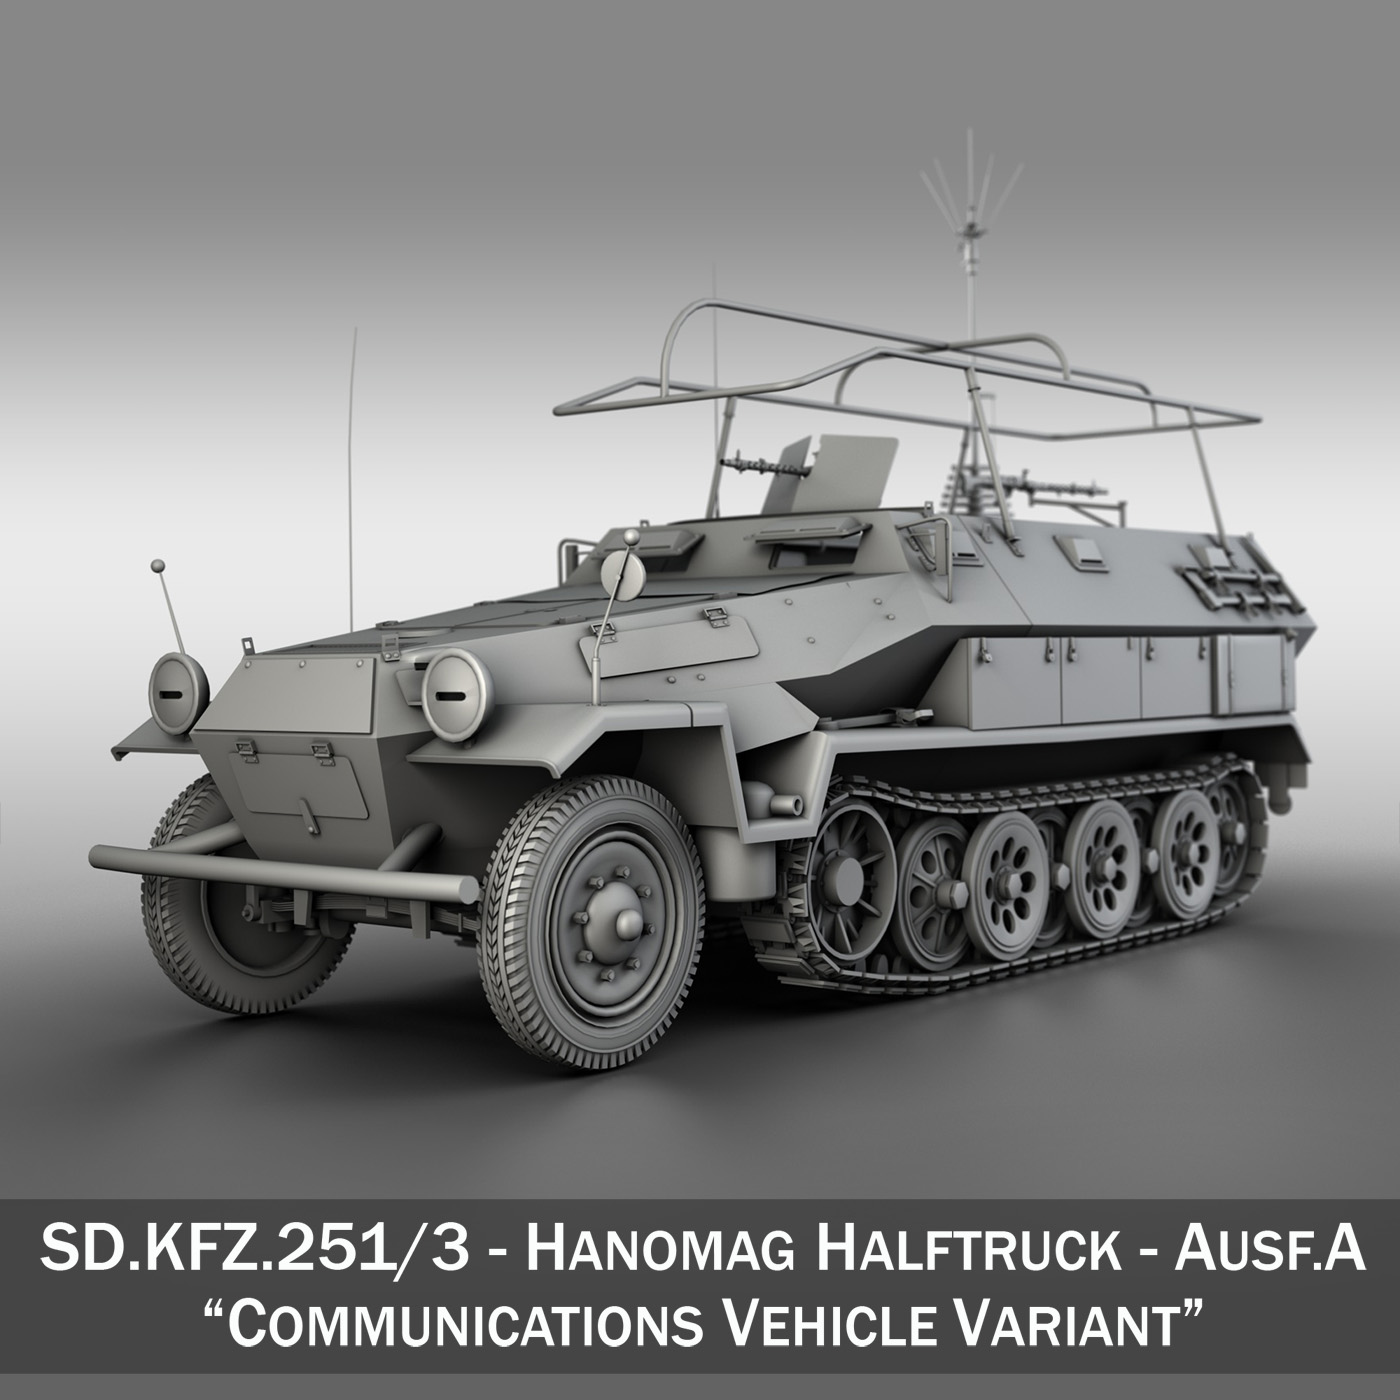 sd.kfz 251/3 iv ausf.a – hanomag radio vehilce 3d model 3ds fbx c4d lwo obj 201263